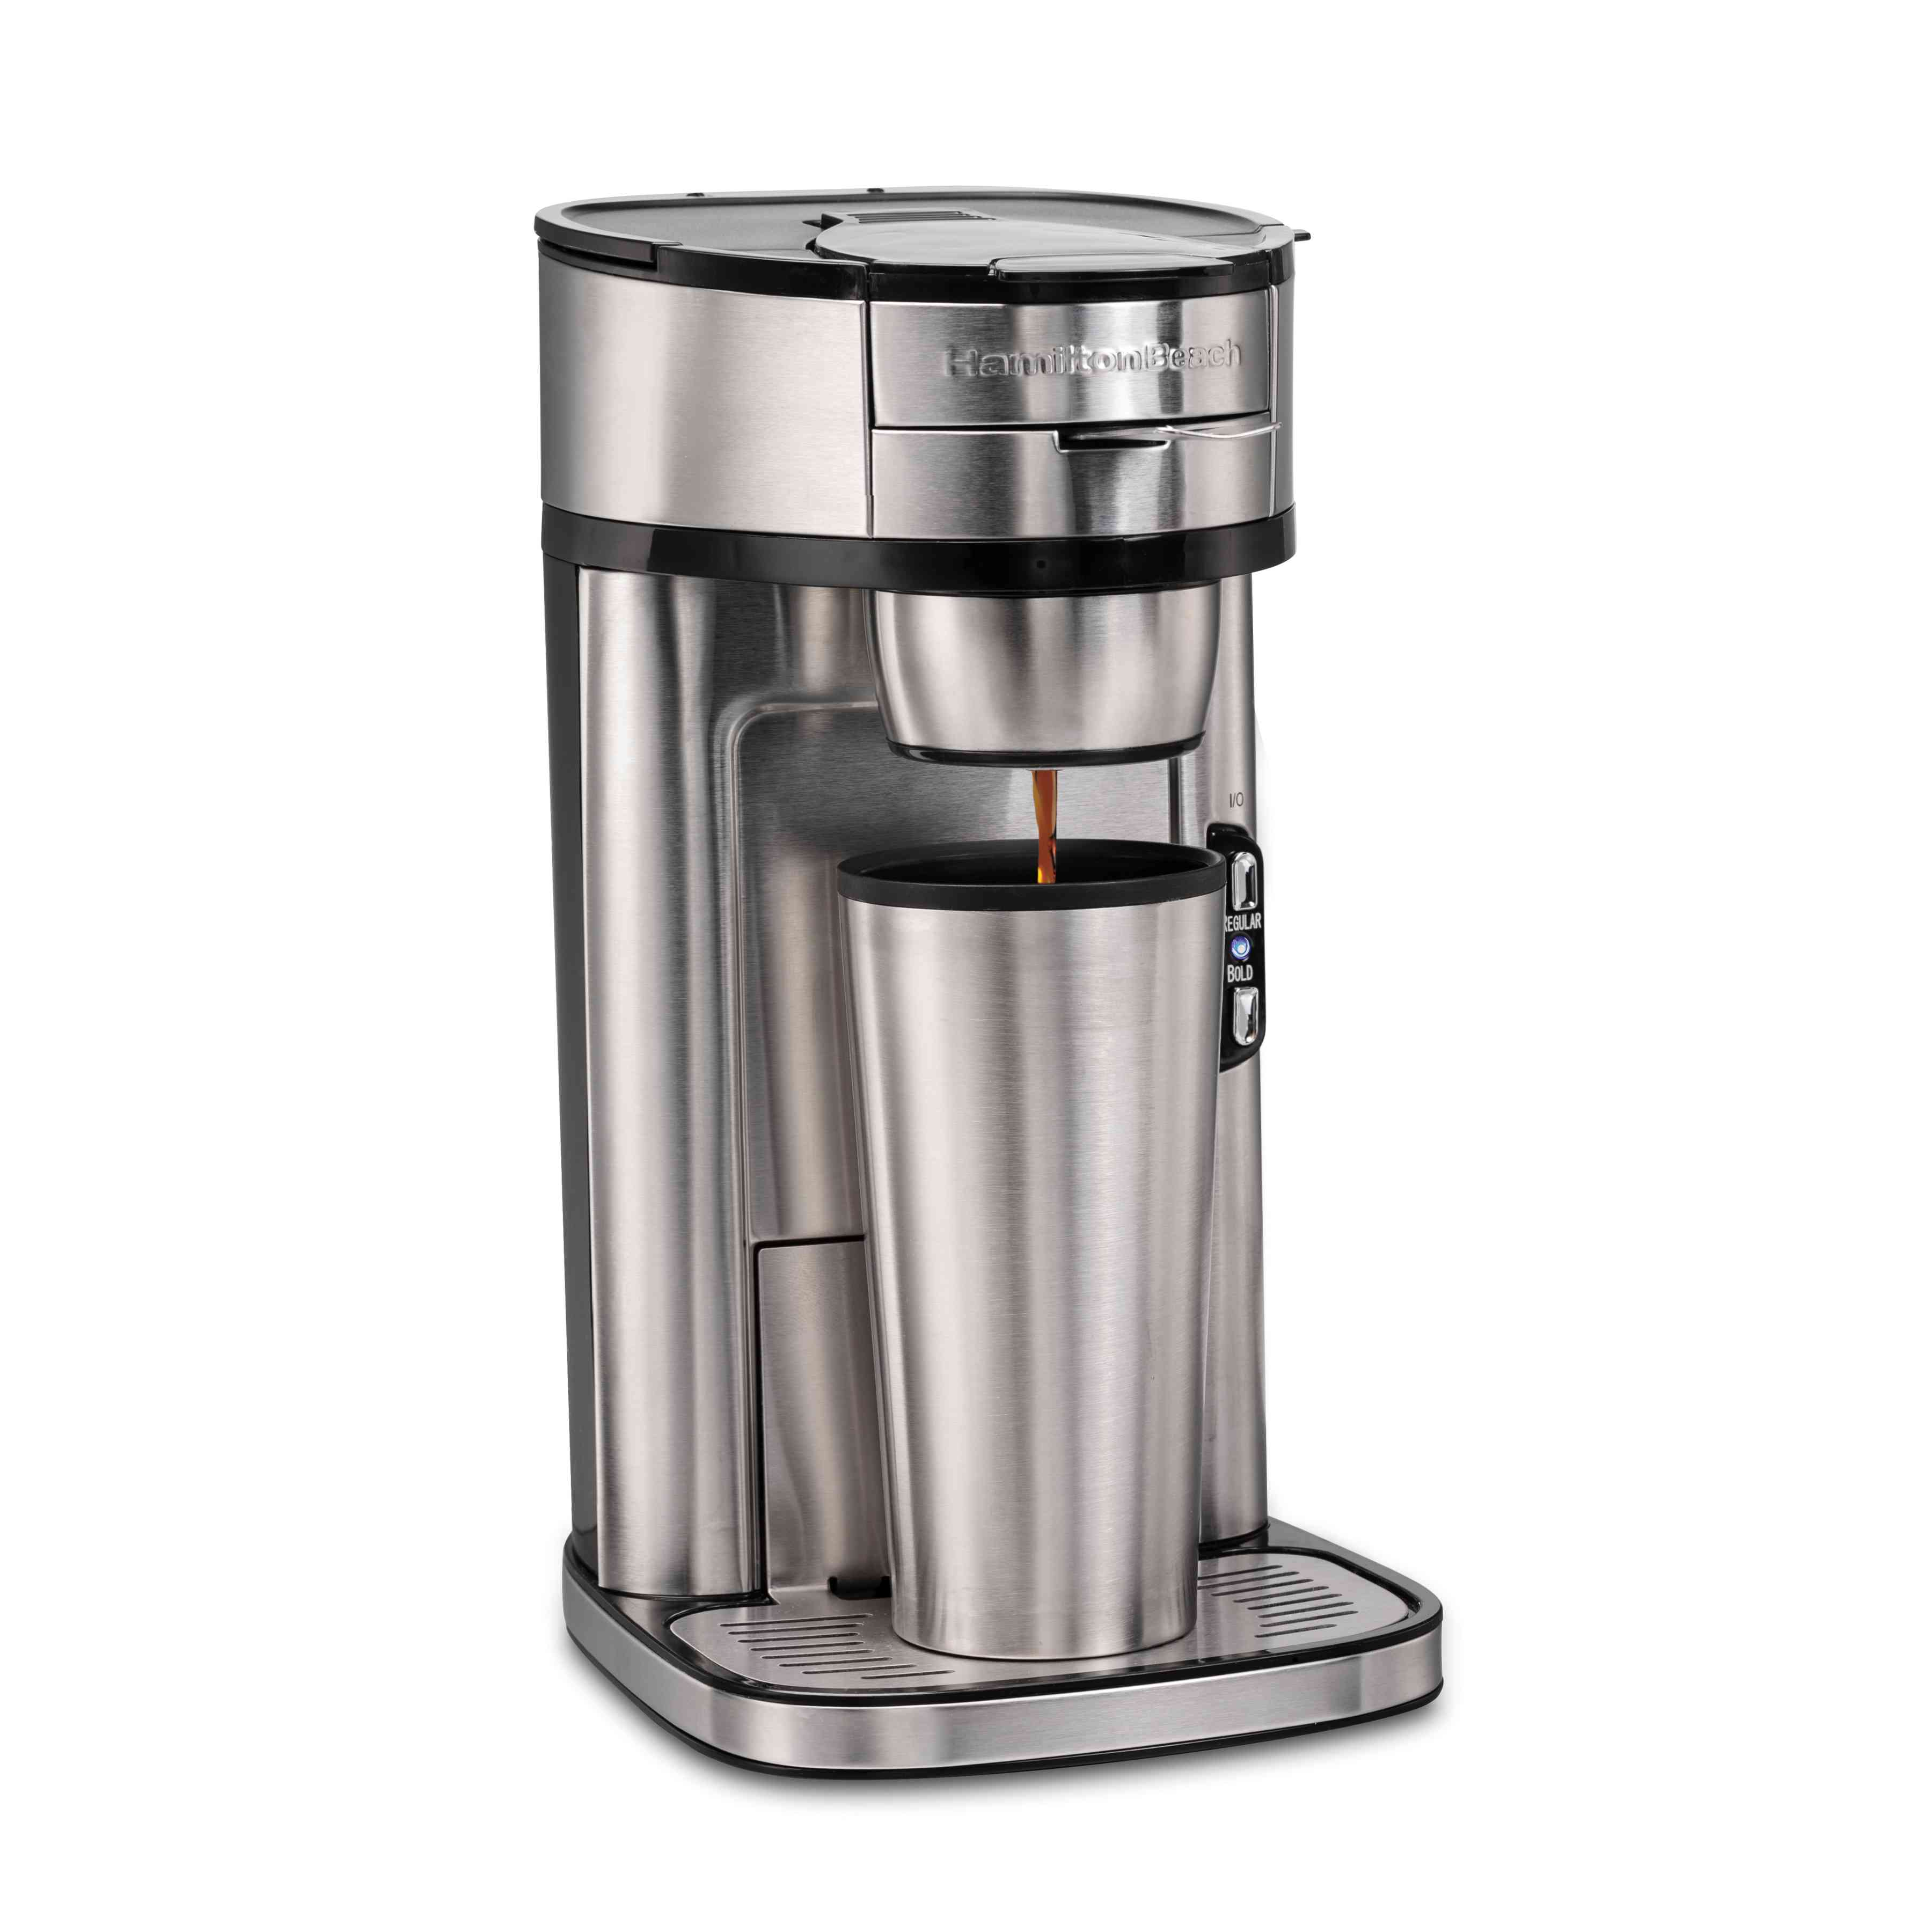 The Scoop Single-Serve Coffee Maker